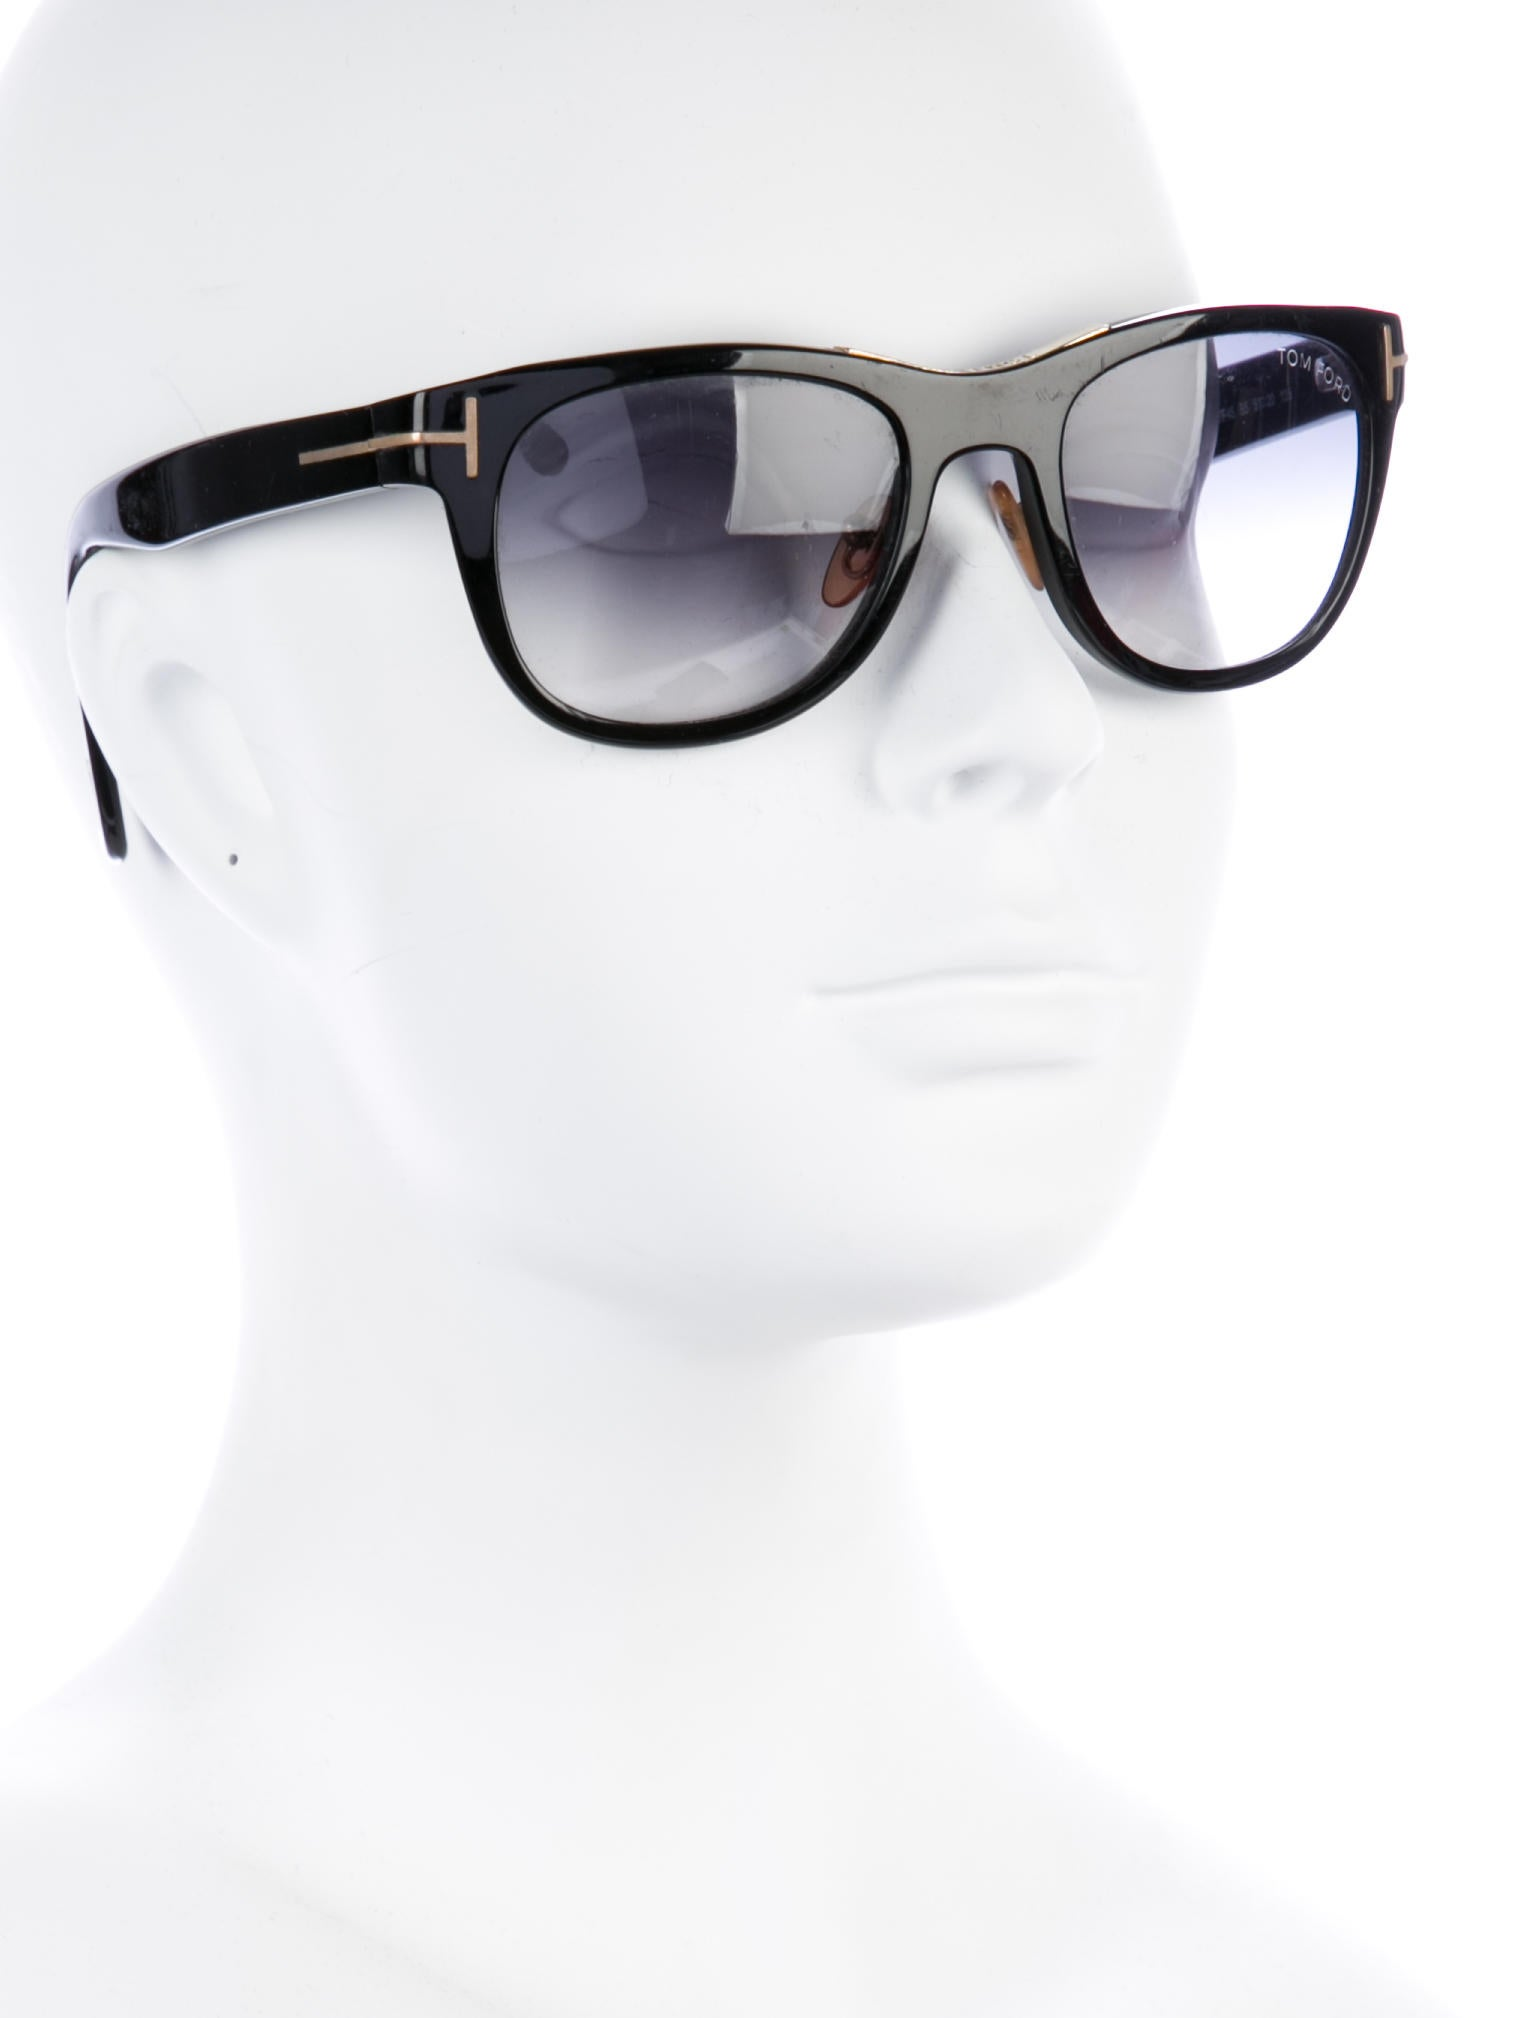 8b8c0d71fd78 Tom Ford Eyewear Jack Resin Wayfarer